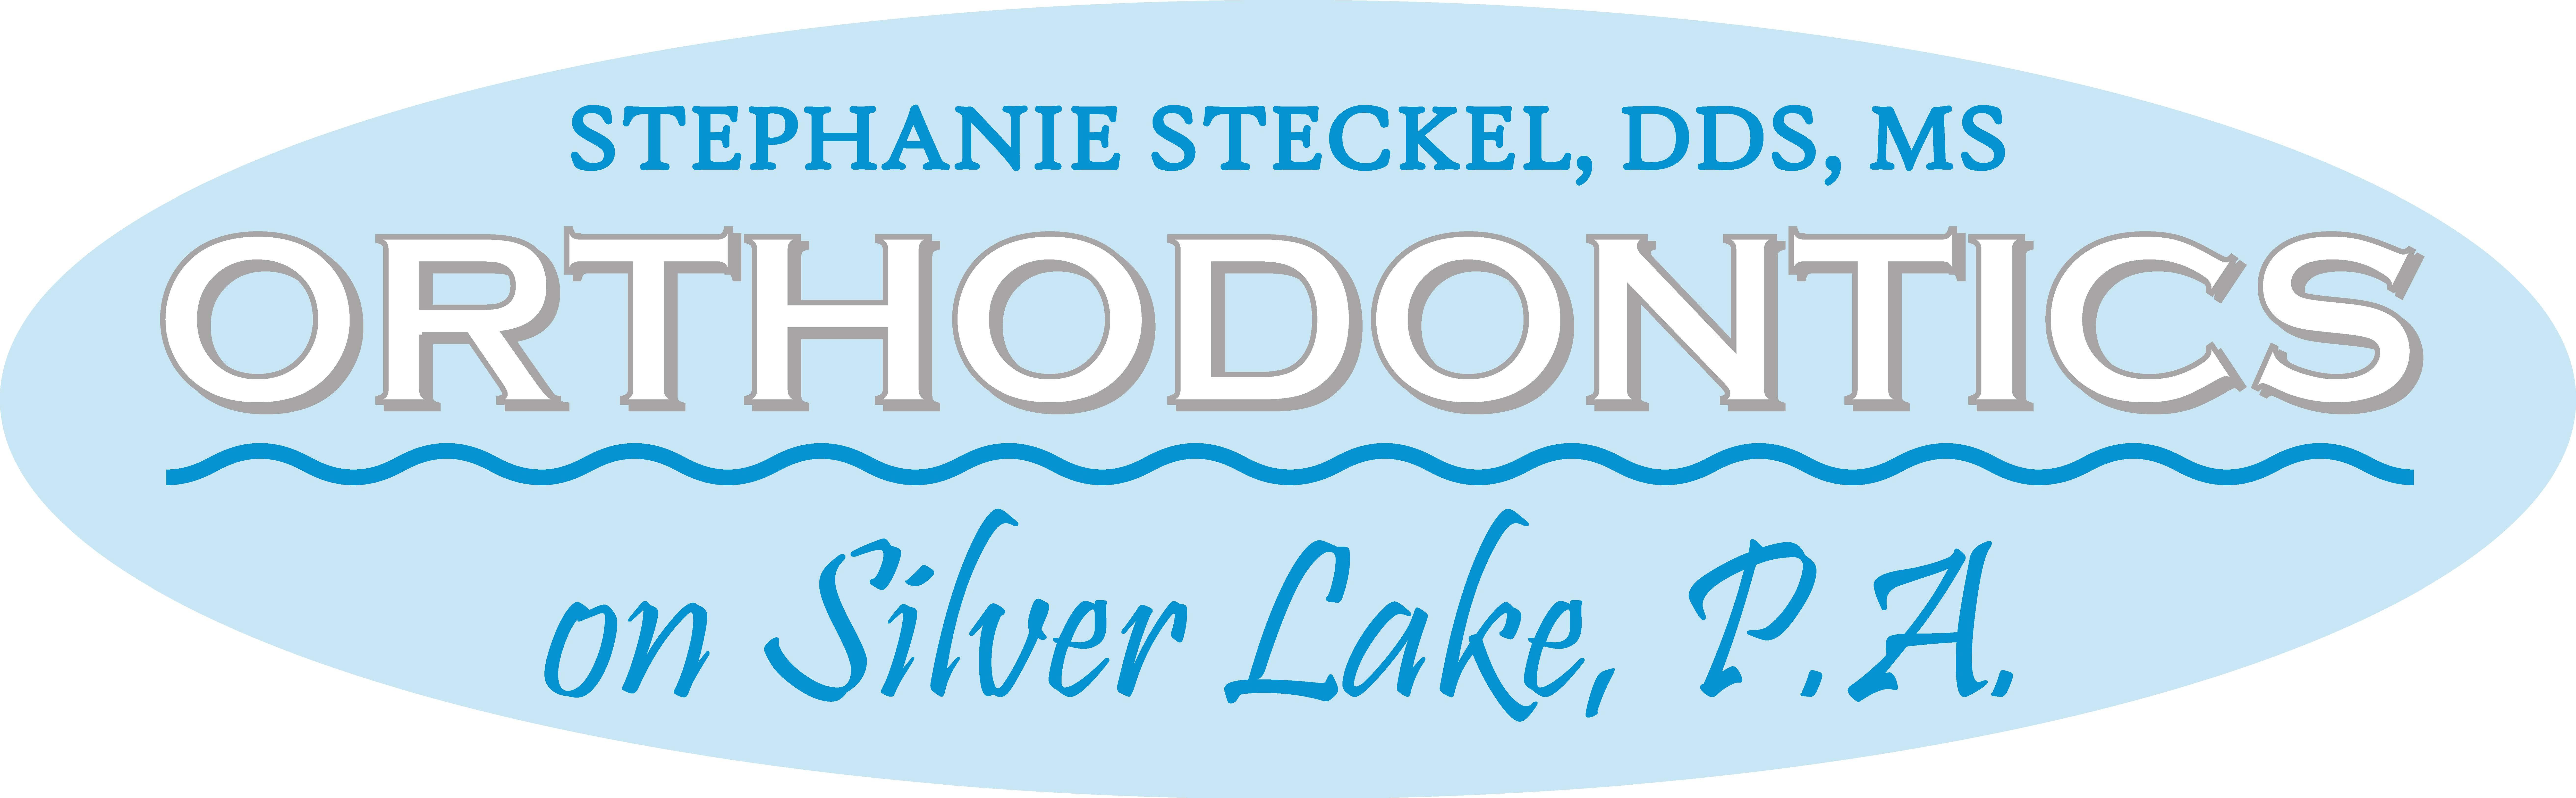 Orthodontics on Silver Lake Dr. Stephanie Steckel